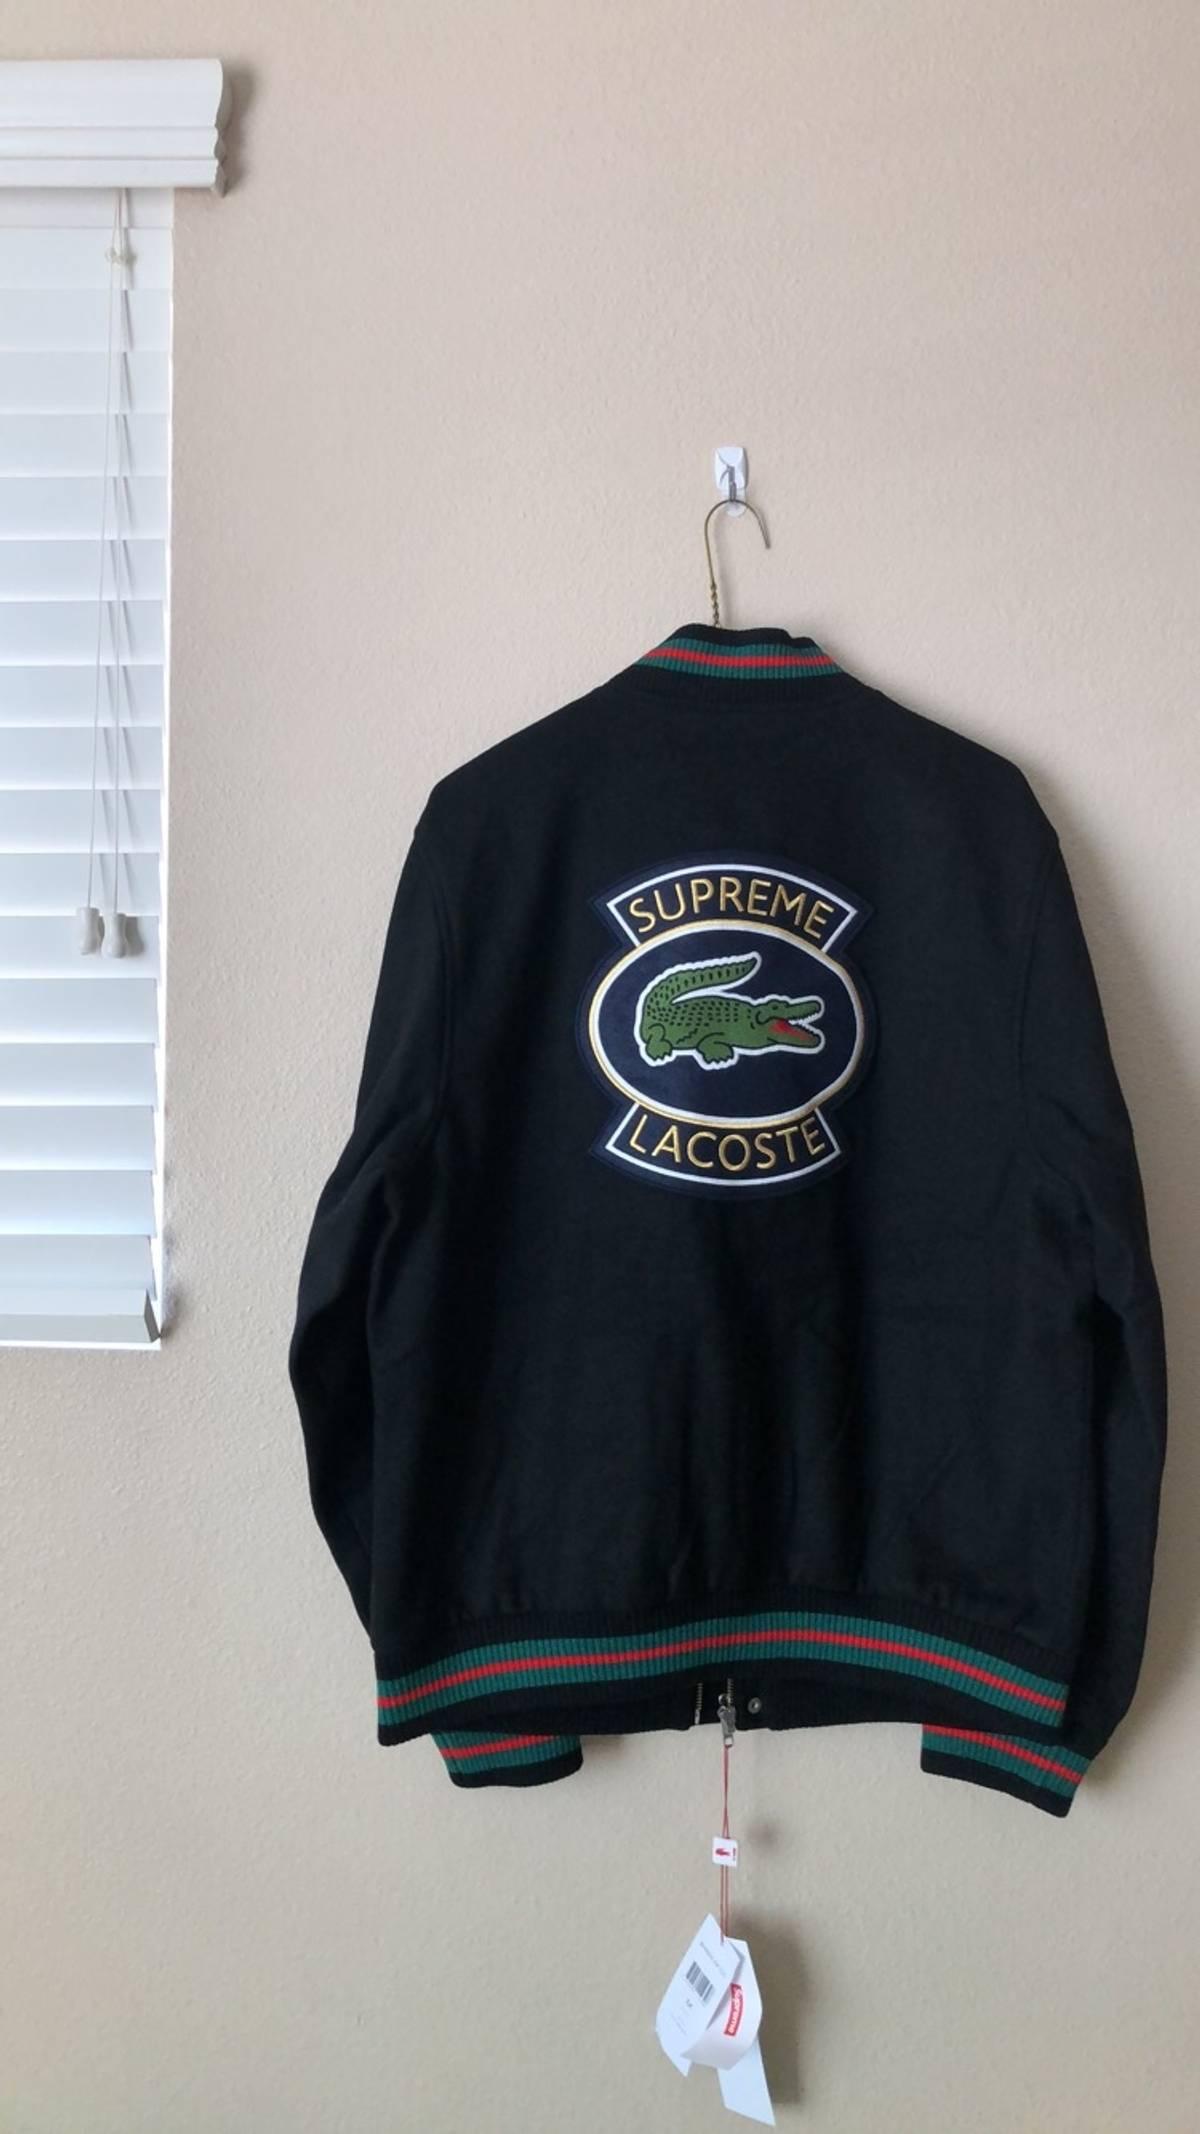 f164b16898029 Supreme  LAST DROP  Supreme LACOSTE Wool Varsity Jacket - Black Size m -  Light Jackets for Sale - Grailed